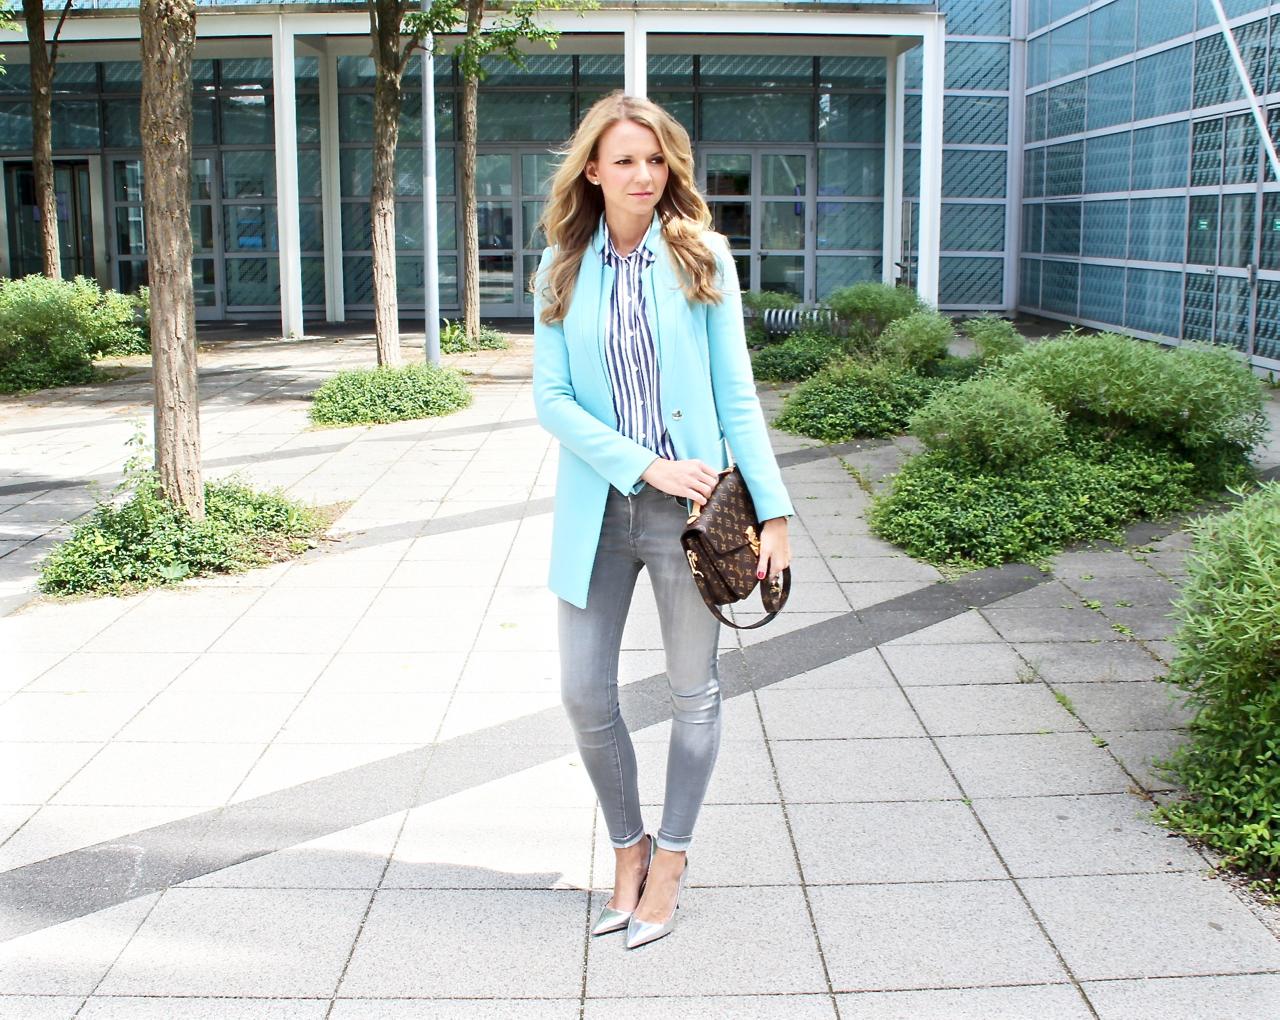 Outfit: Türkiser Mantel und silberne High Heels Zara Mango Fashion Outfit Mode Jennifer LouisVuitton LV LVOE Lifestyle PepperAndGold Style Pochette